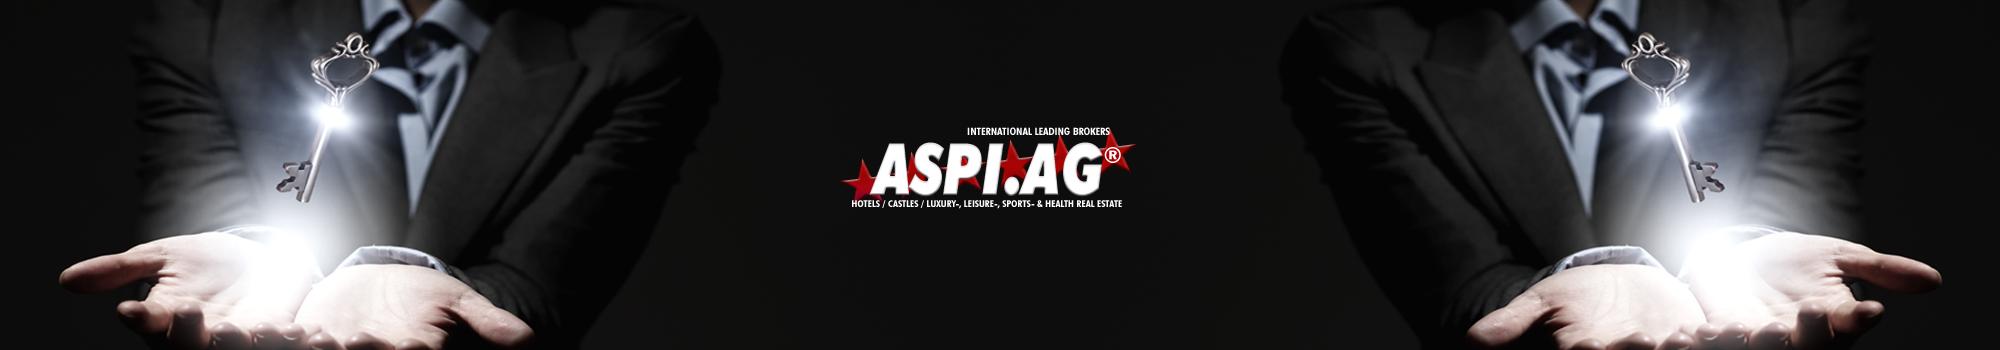 ASP Hotel verkauft verpachtet sold leased